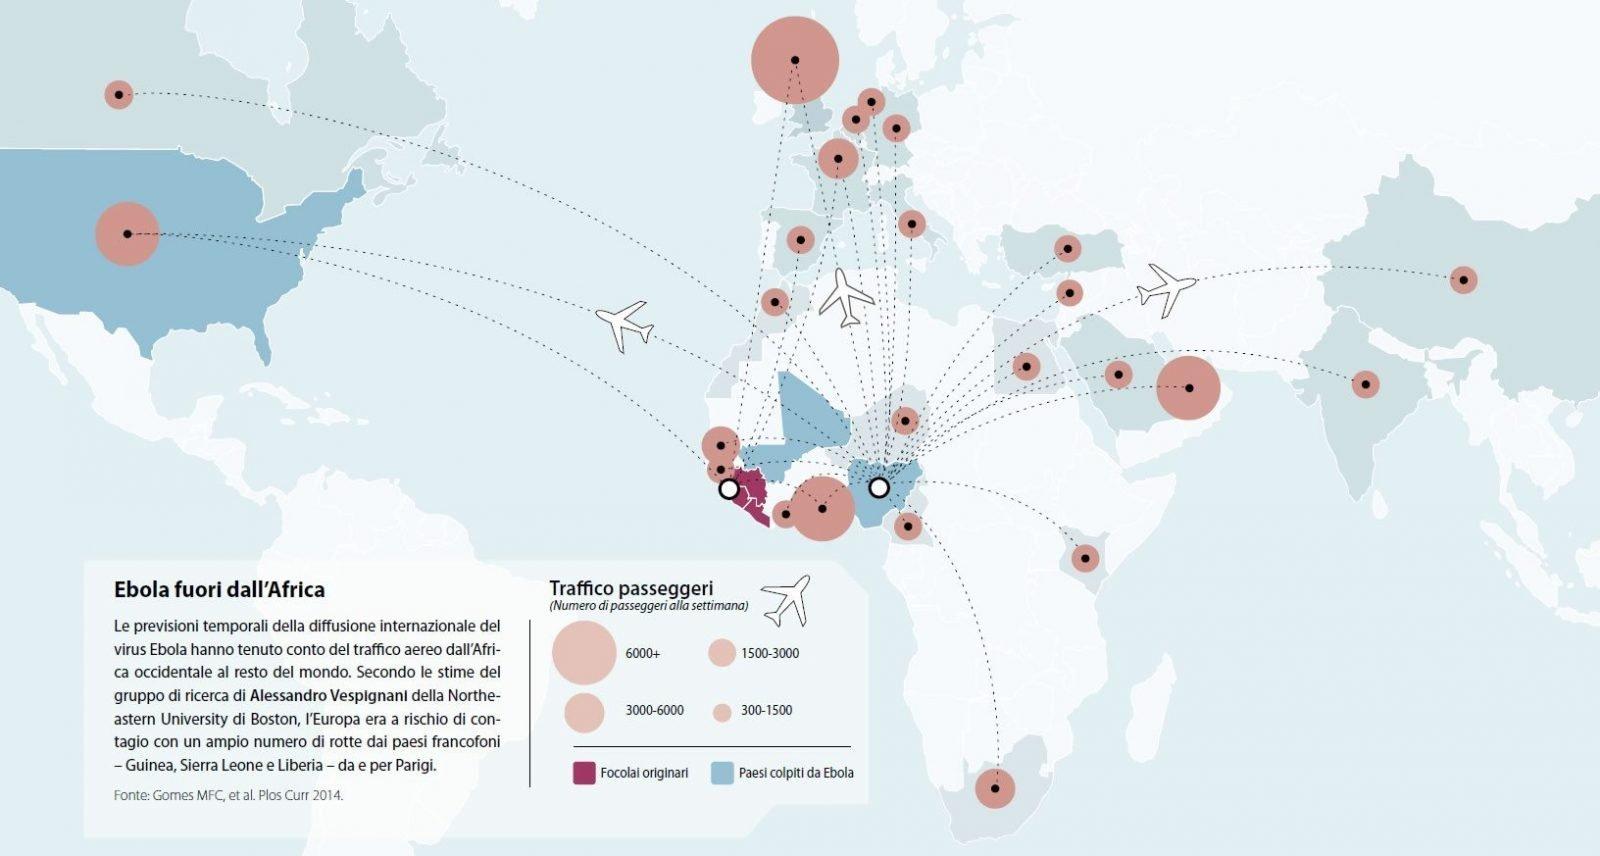 ebola-fuori-dall-africa 165593c04c64